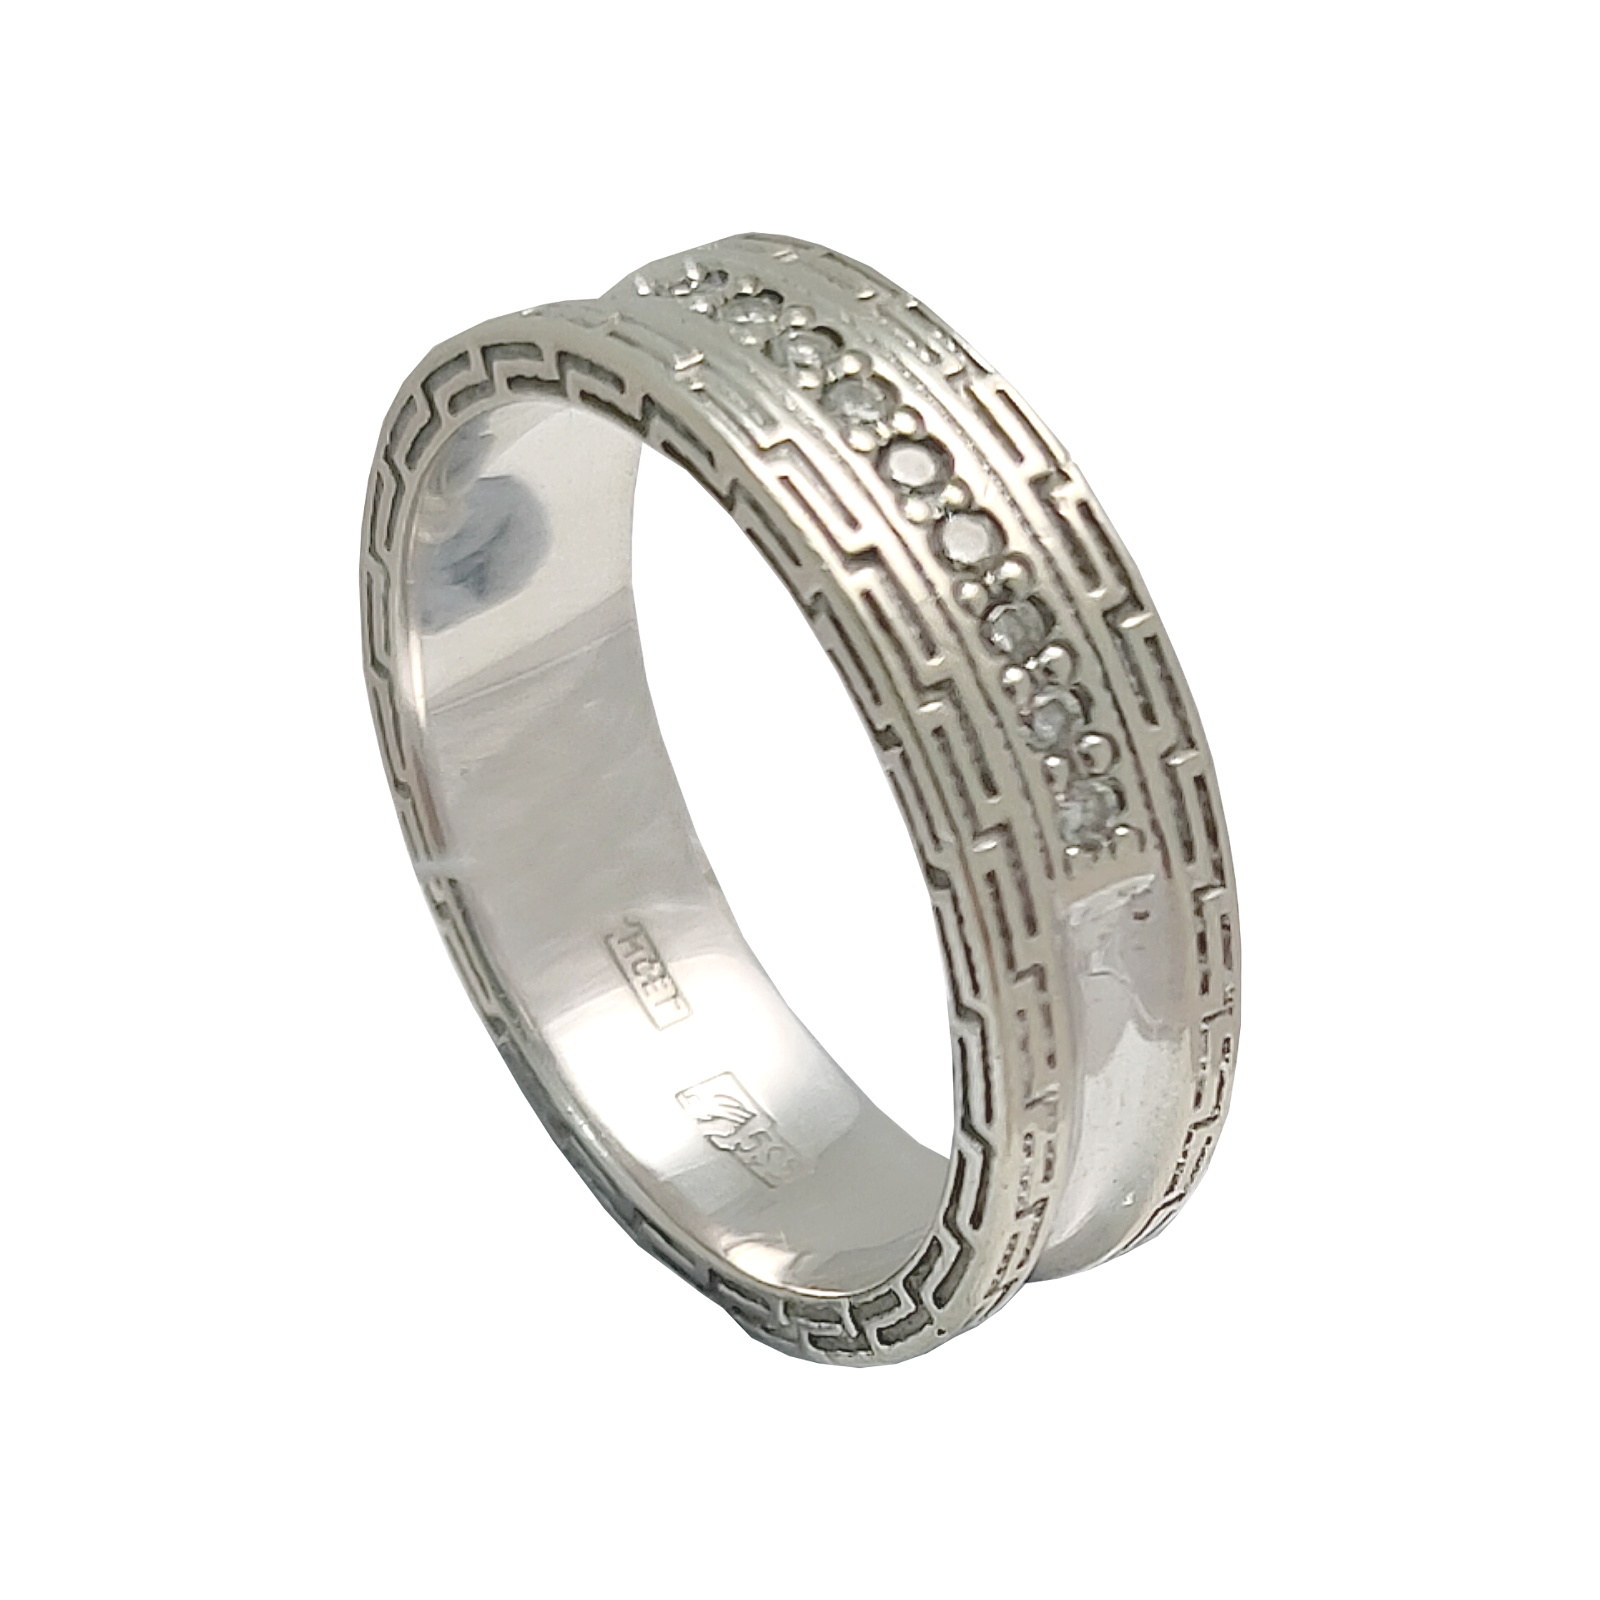 Кольцо иззолота сбриллиантом (57 гр.)